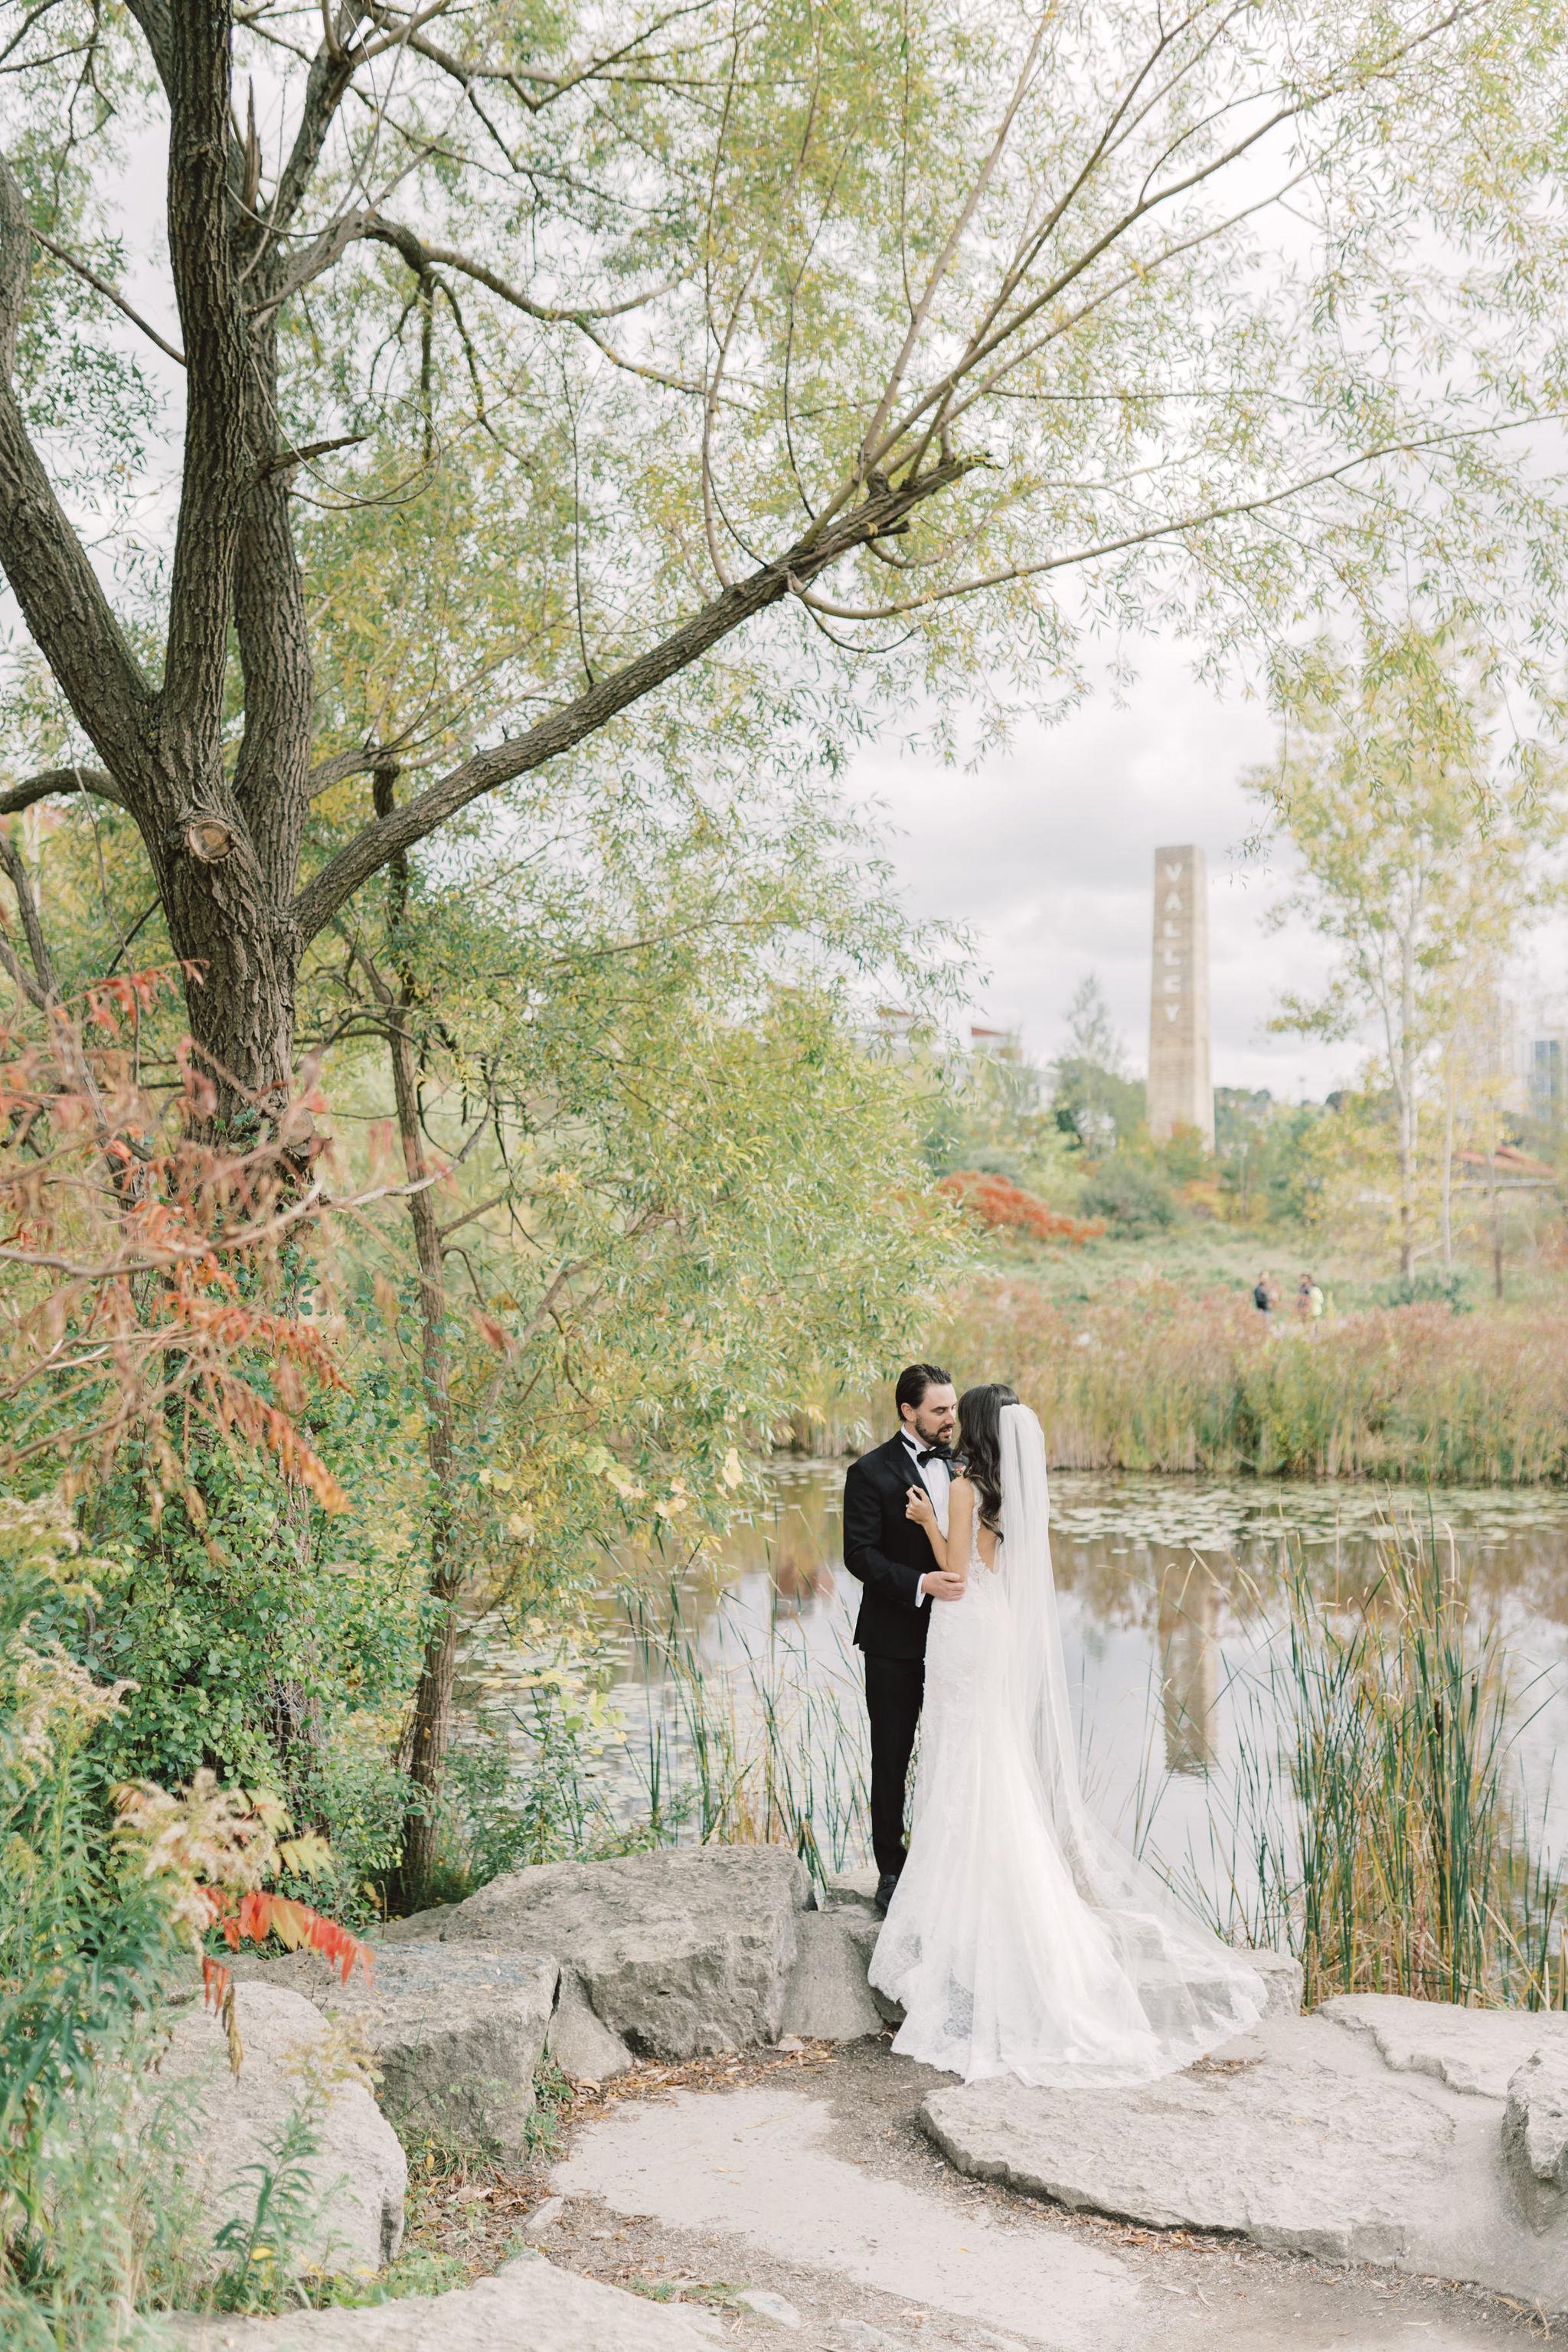 0509-artiese-evergreen-brickworks-wedding-ashleycraig-03266.jpg